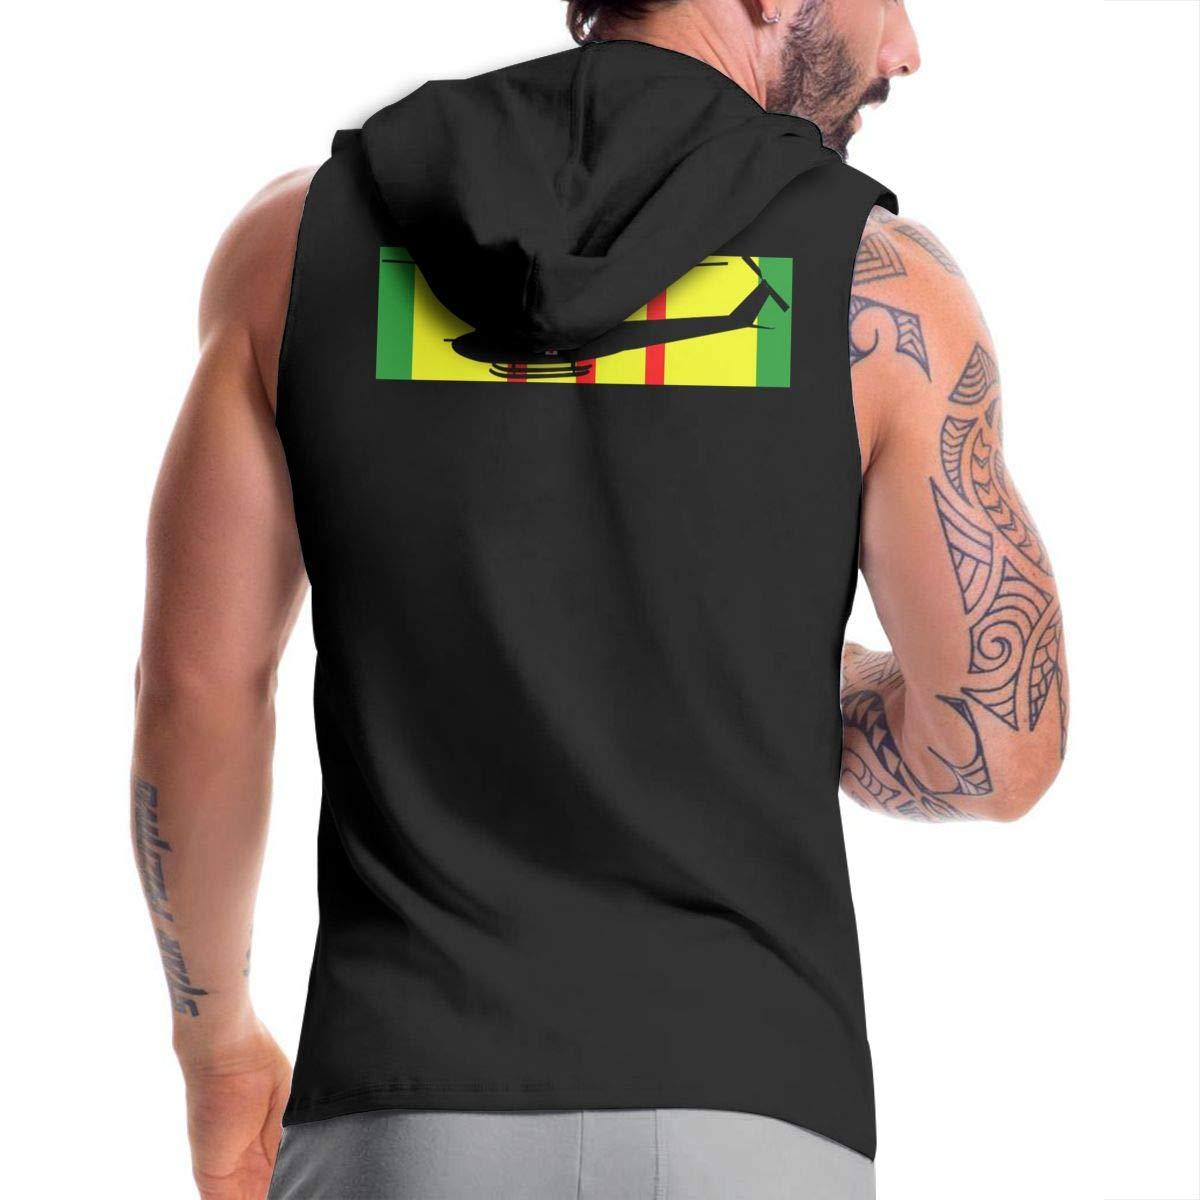 NMBOJR Ribbon Vietnam Mens Hipster Hip Hop Hoodies Shirts